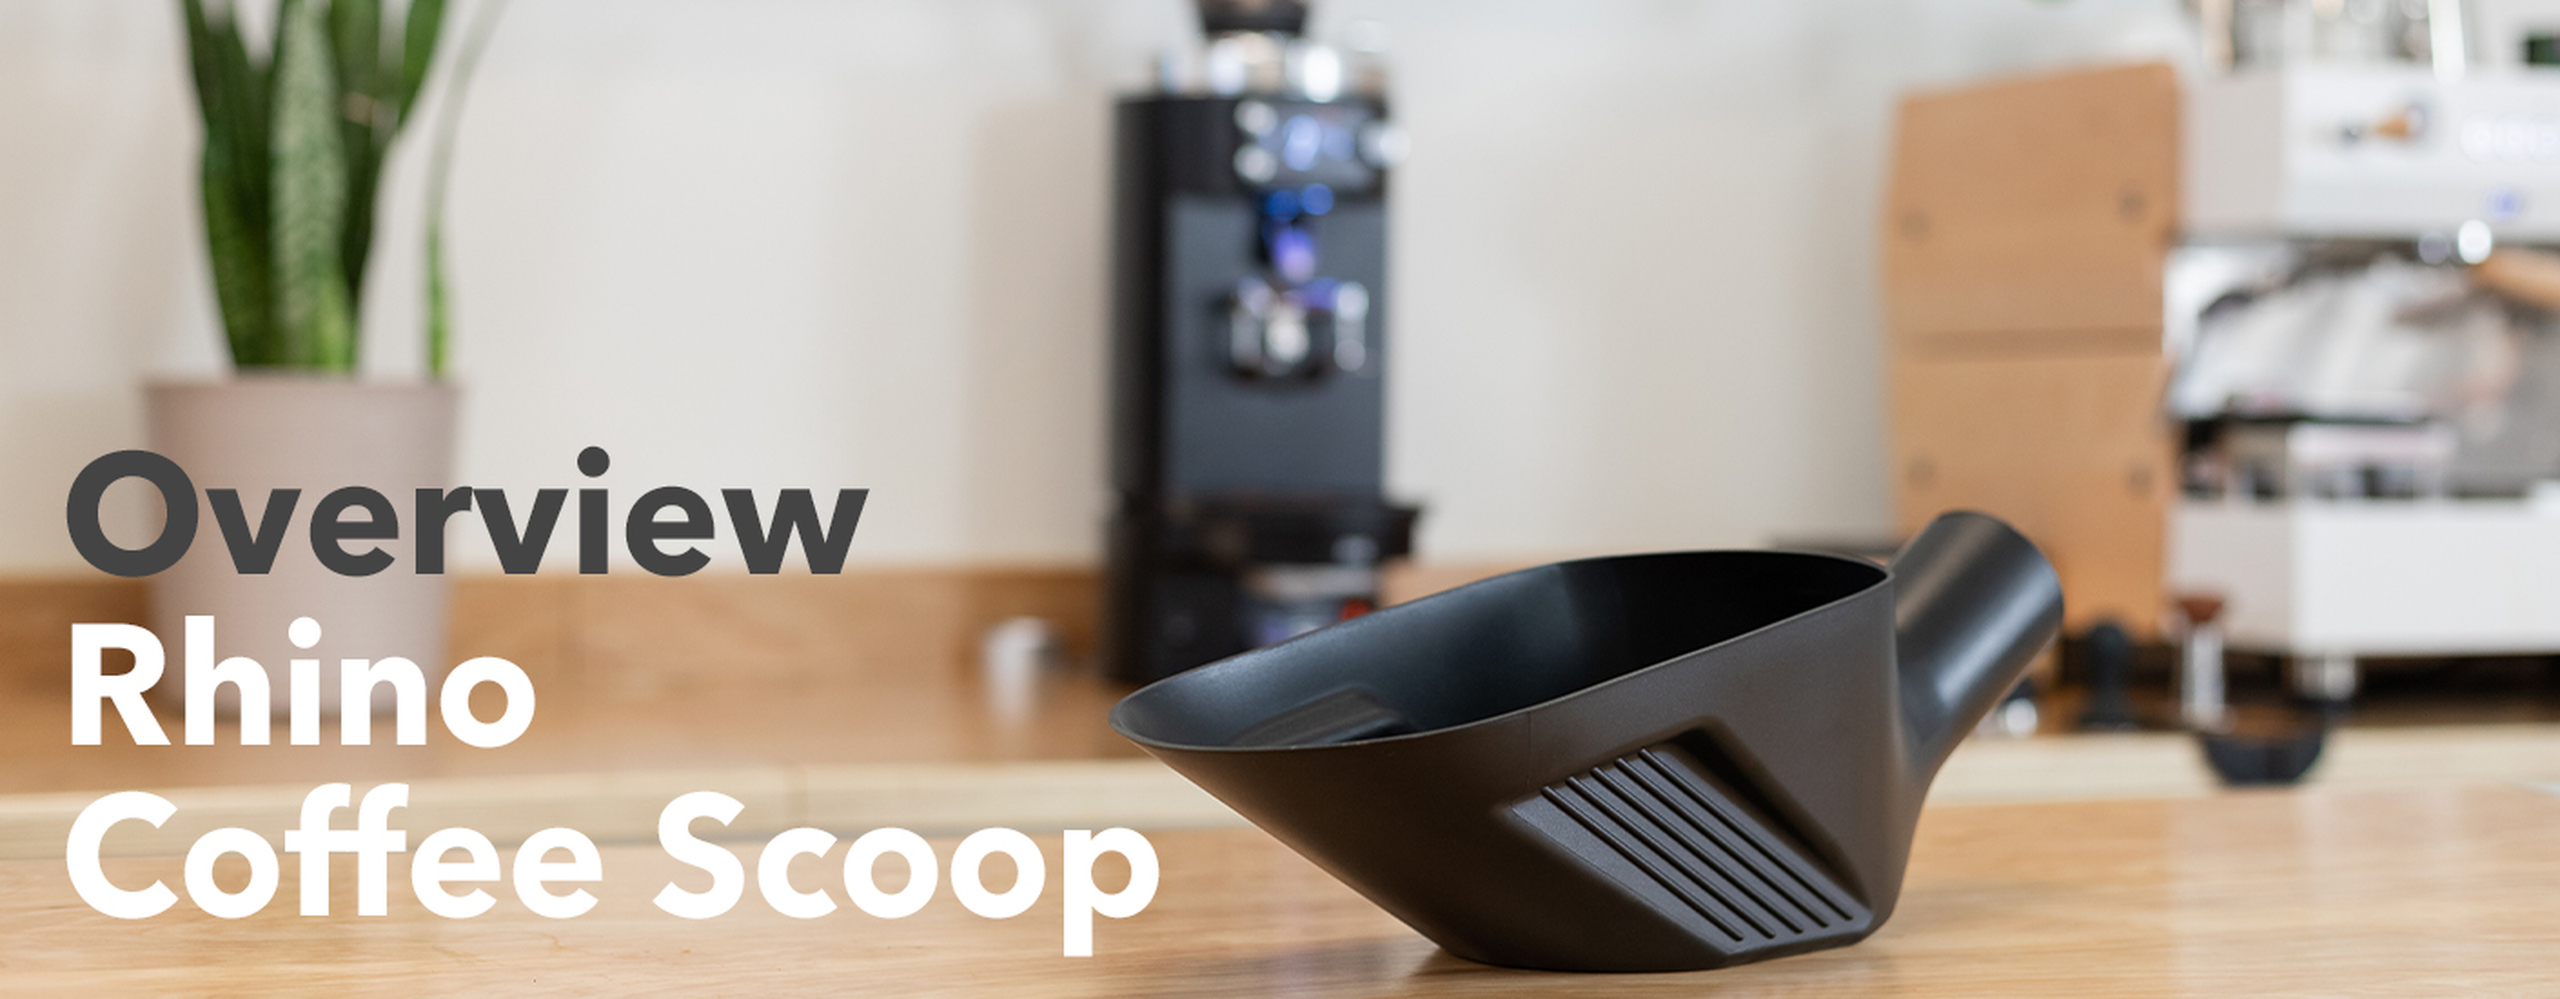 Rhino Coffee Scoop